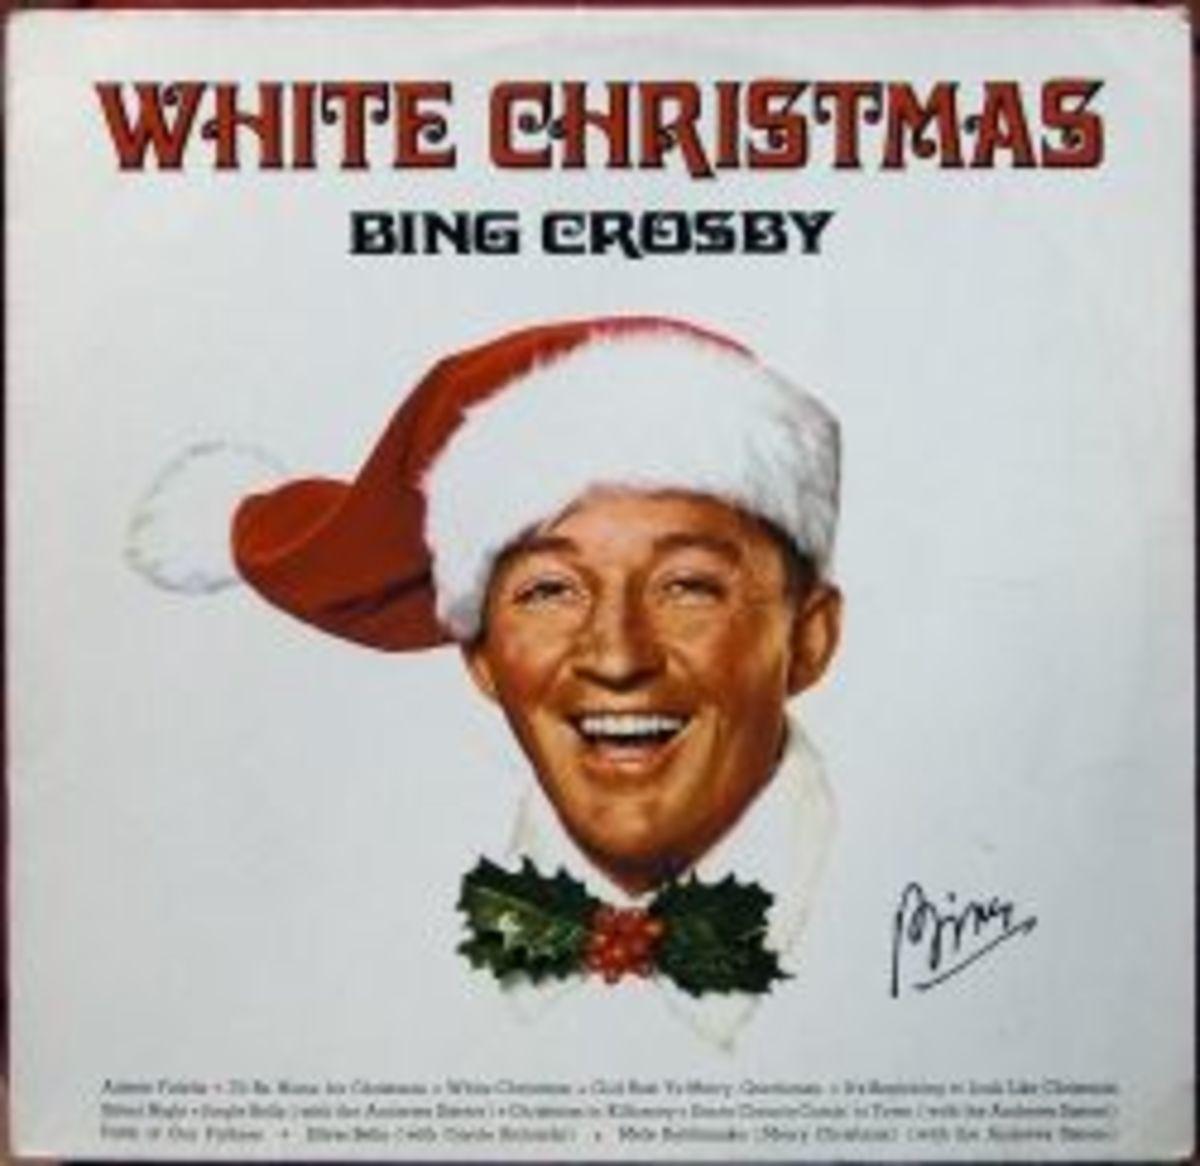 Bing Crosby's most famous Christmas album, White Christmas